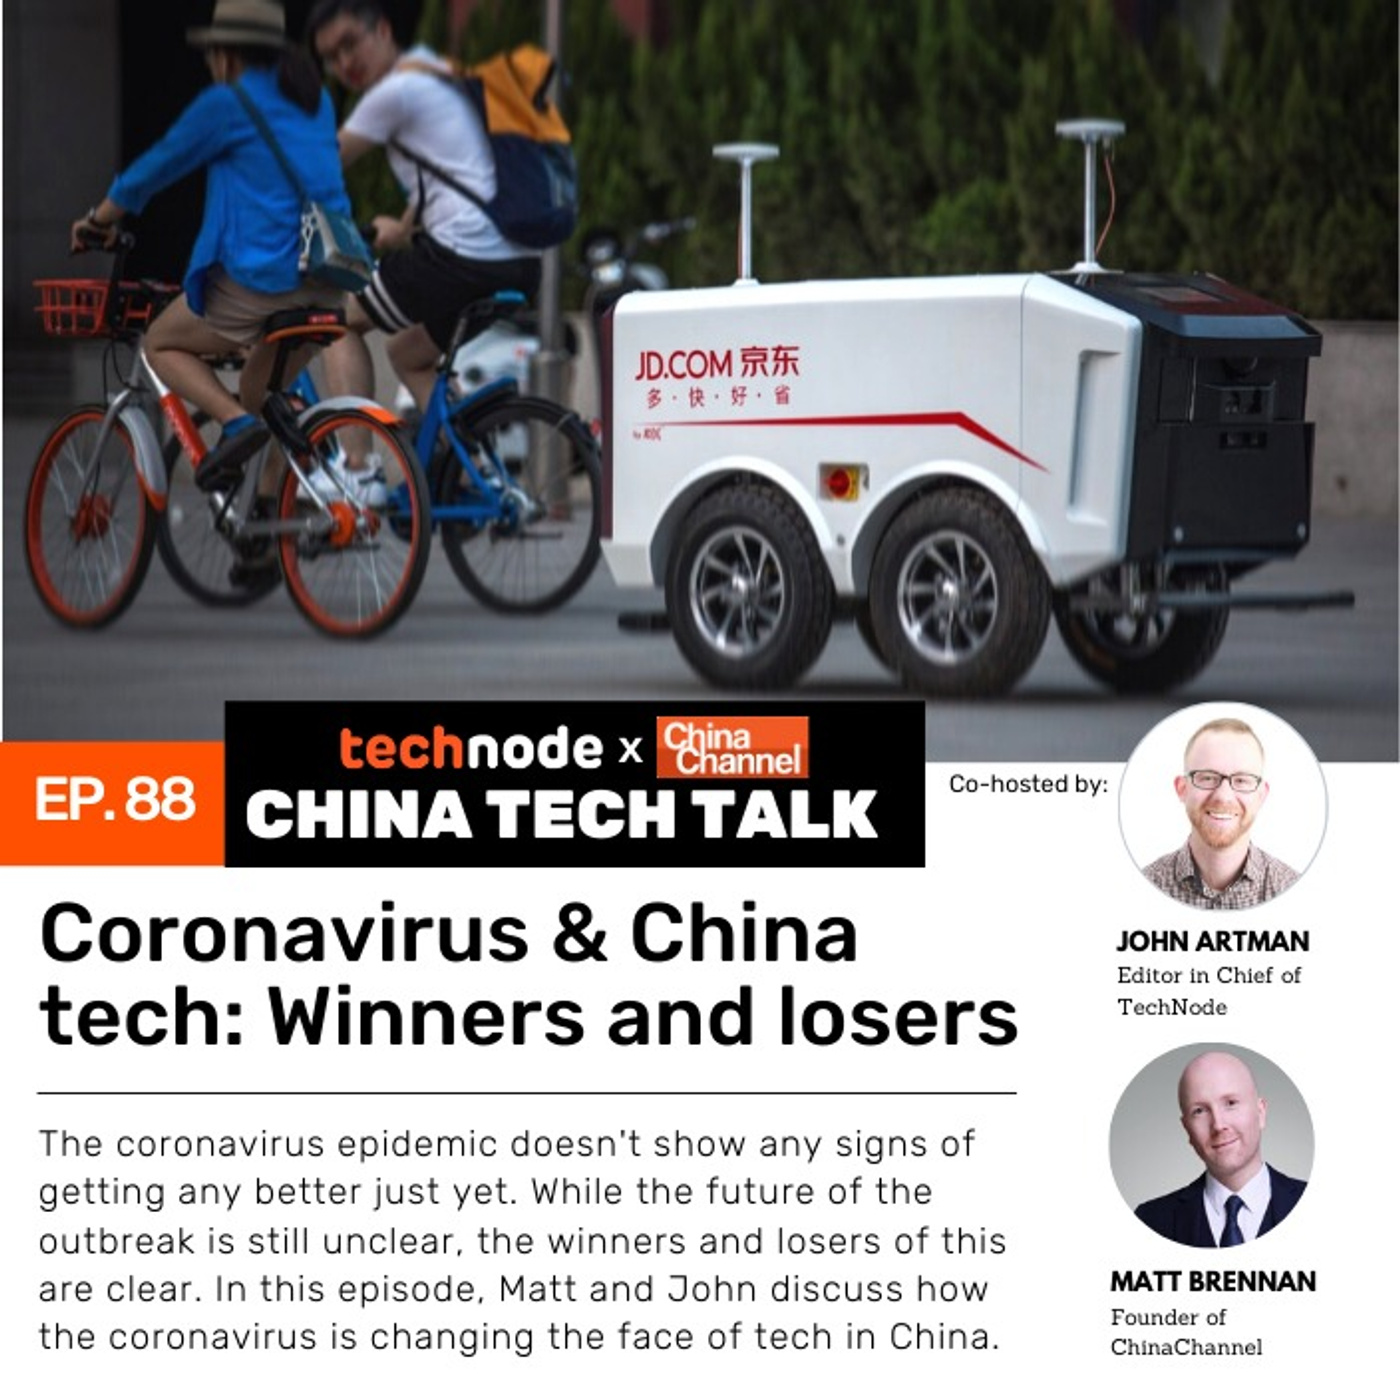 88: Coronavirus & China tech: Winners and losers